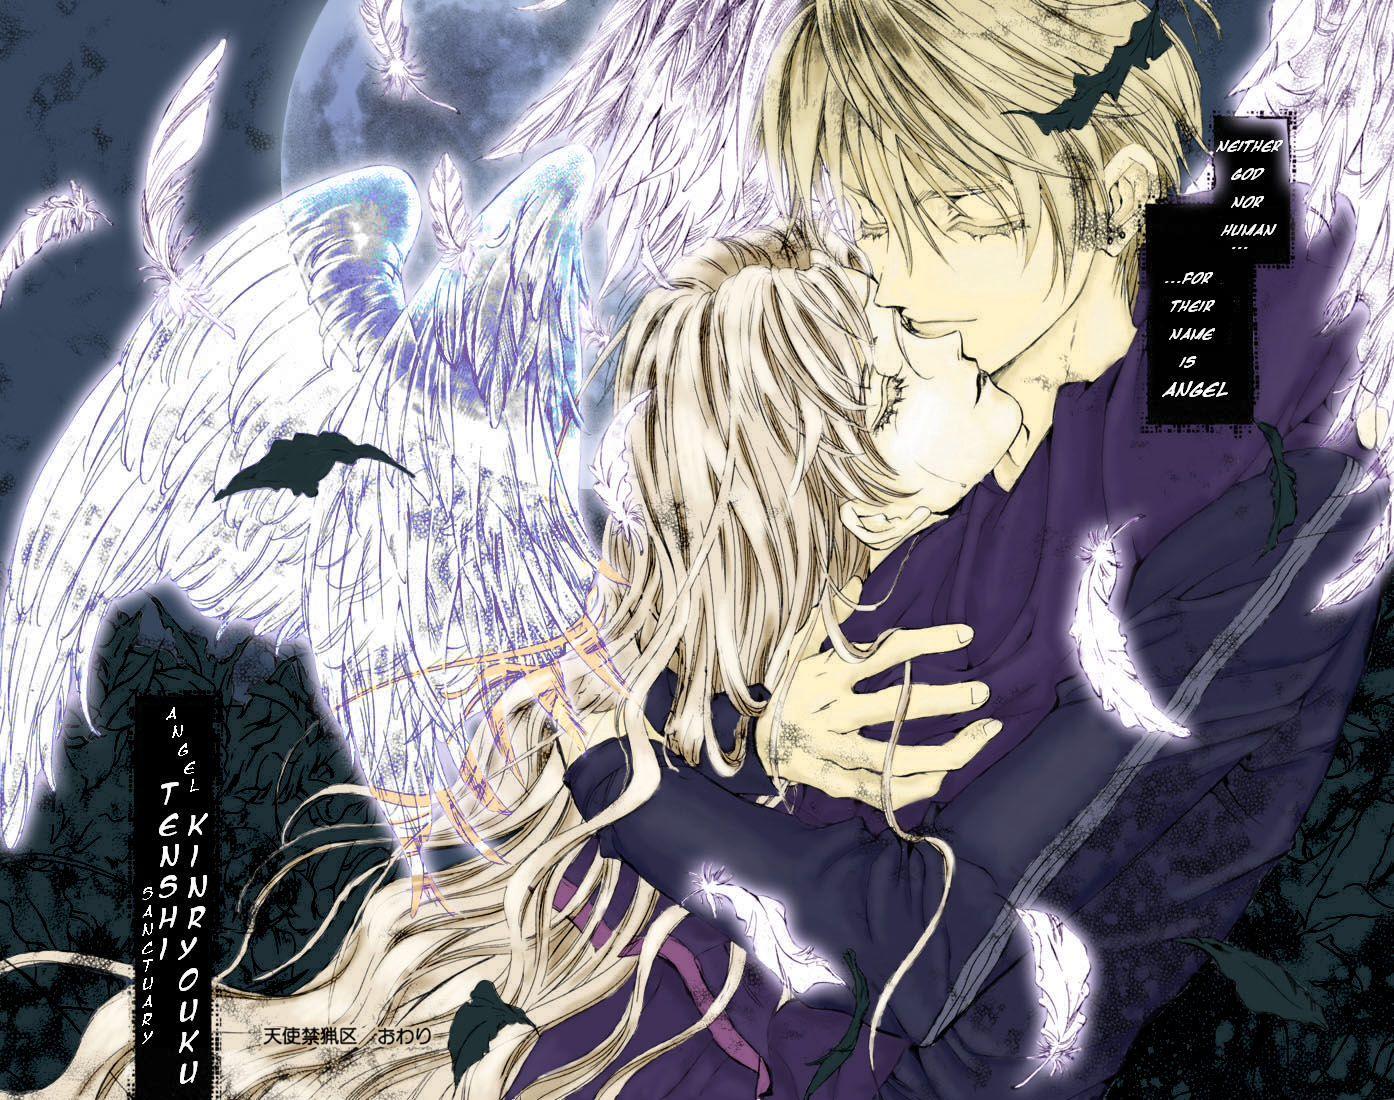 6cd06425c64aea4e862125b873d3a280 - Angel Sanctuary Original Soundtrack - Música [Descarga]